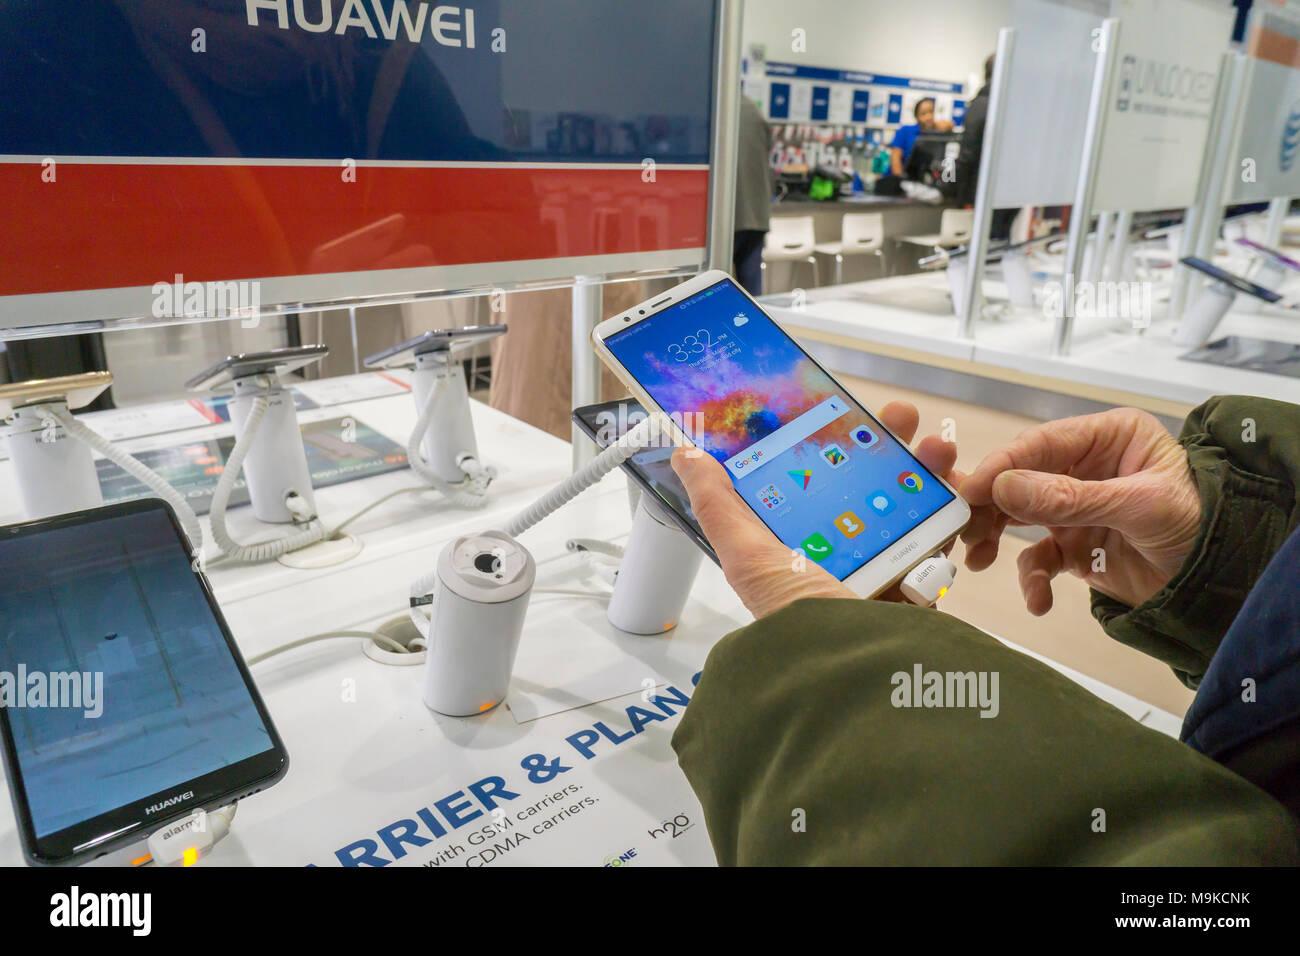 Huawei Store China Stock Photos & Huawei Store China Stock Images